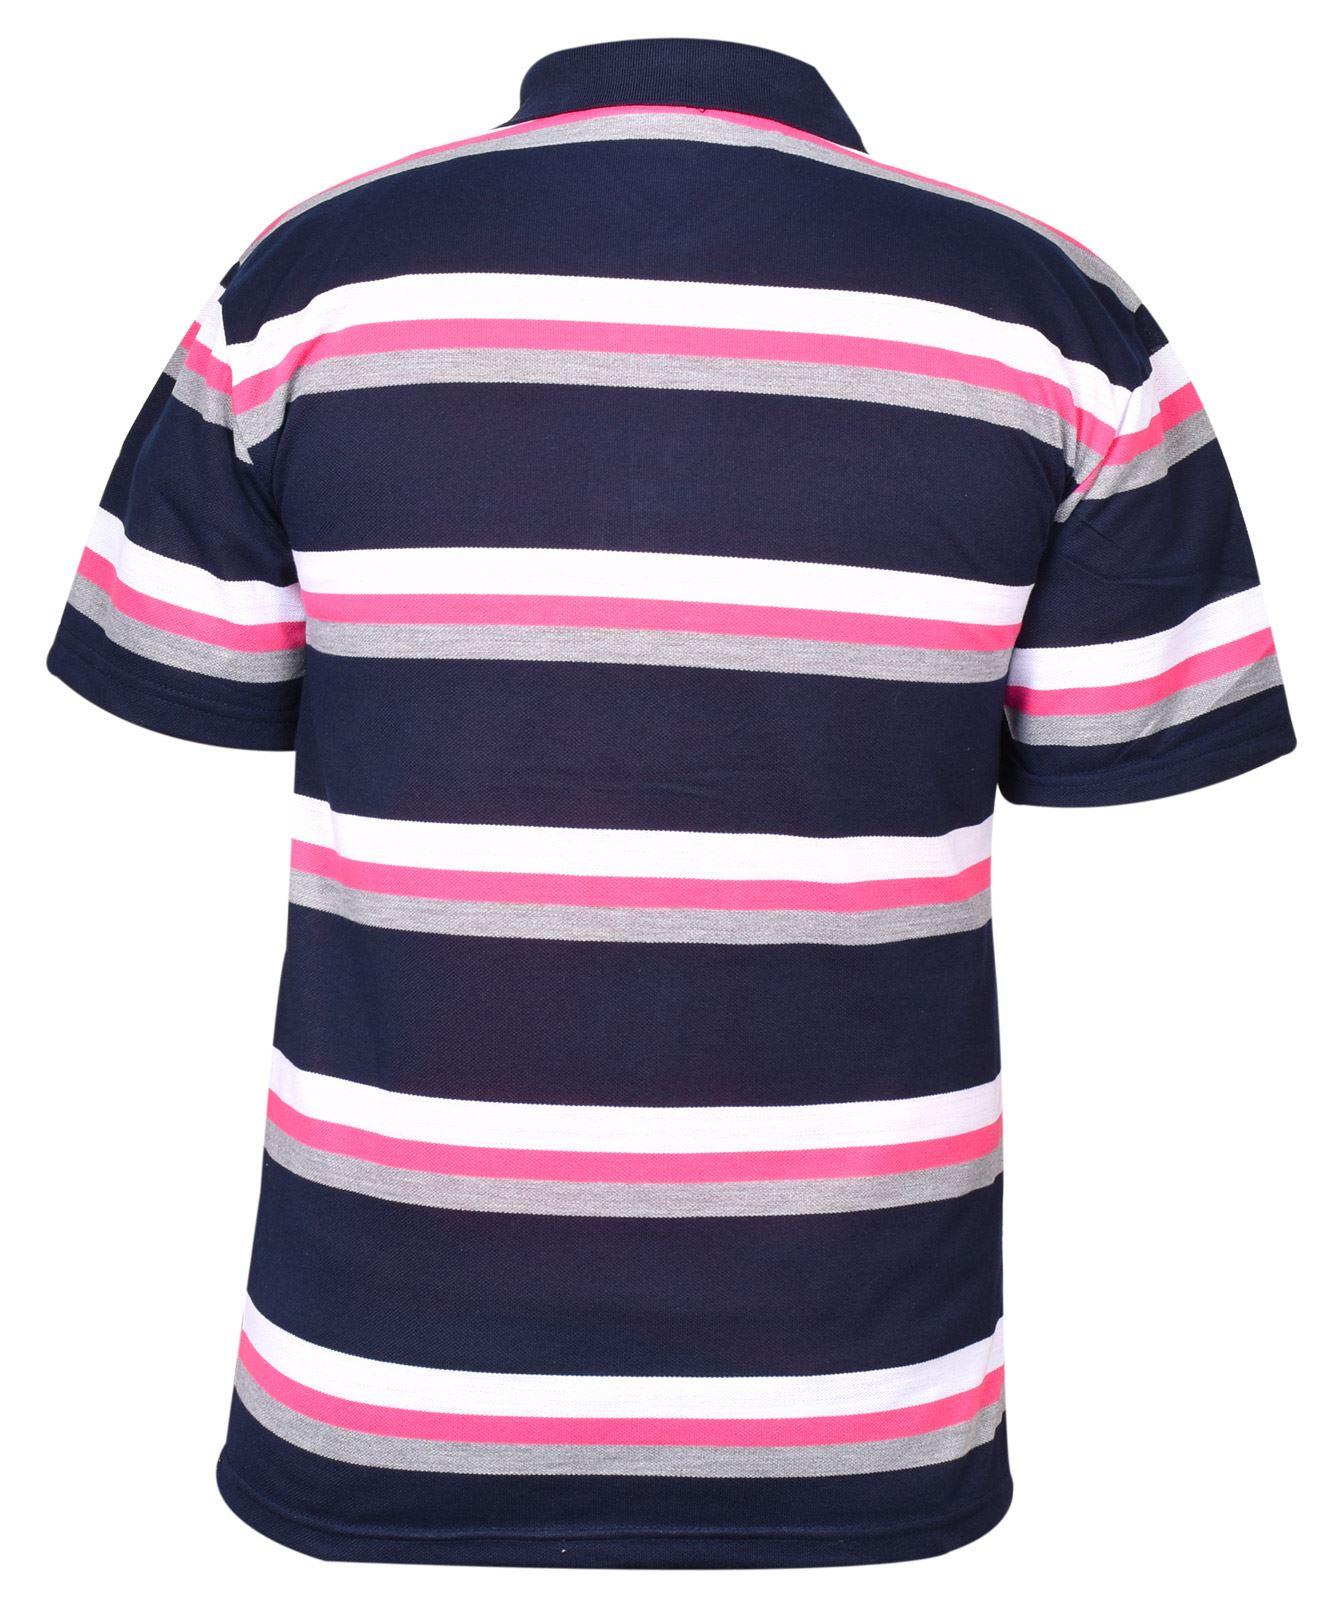 Mens-T-Shirts-Yarn-Dyed-Strip-Pocket-Polo-Shirt-Top-Multi-Colour-Size-M-3XL thumbnail 40